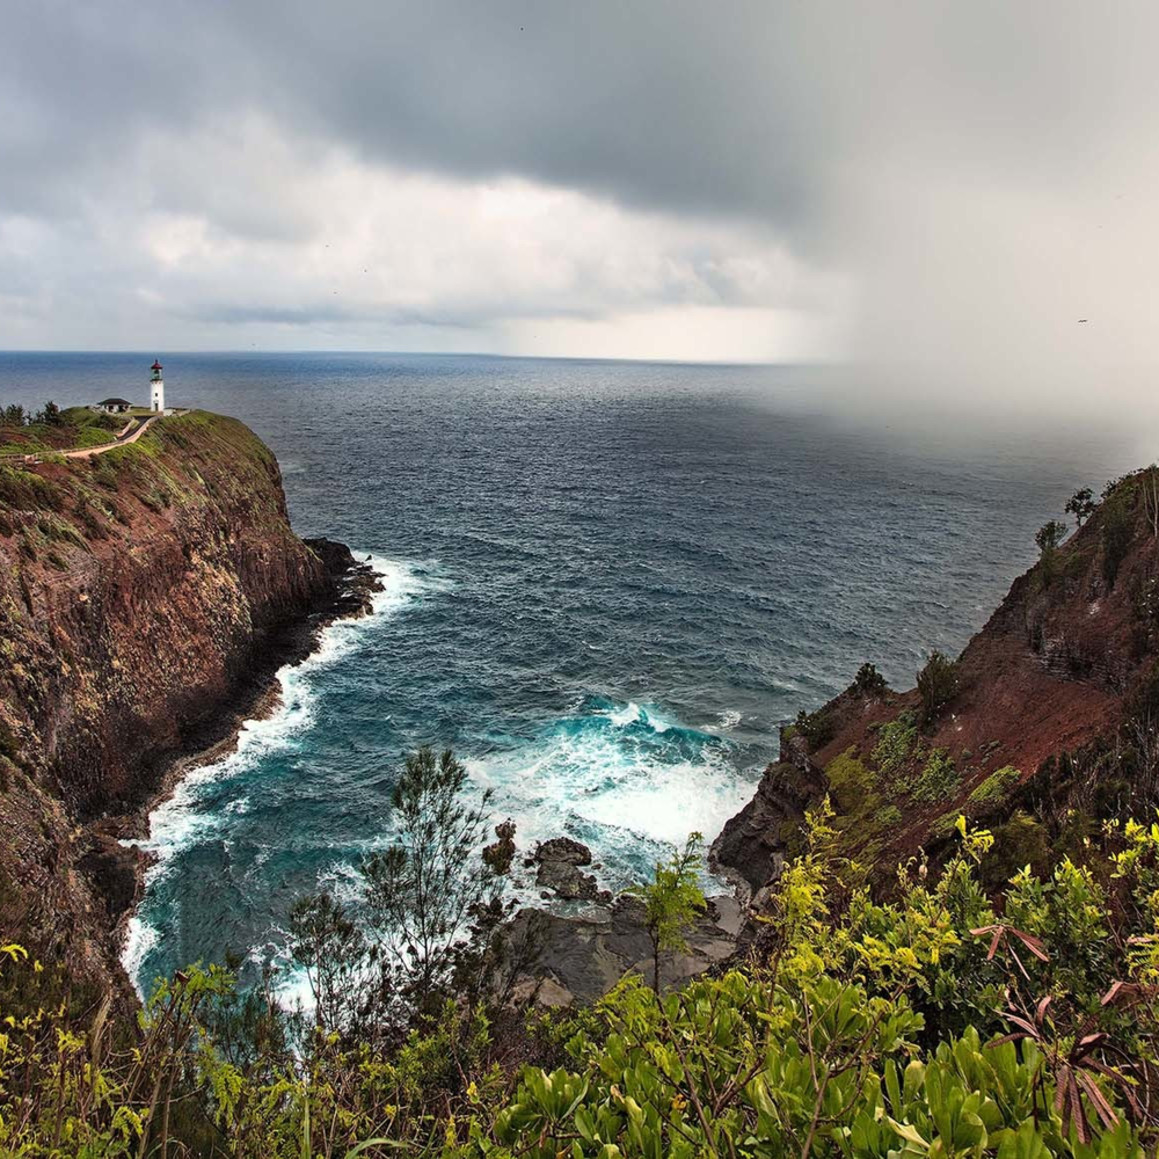 Kilauea lighthouse squall o2rmbm